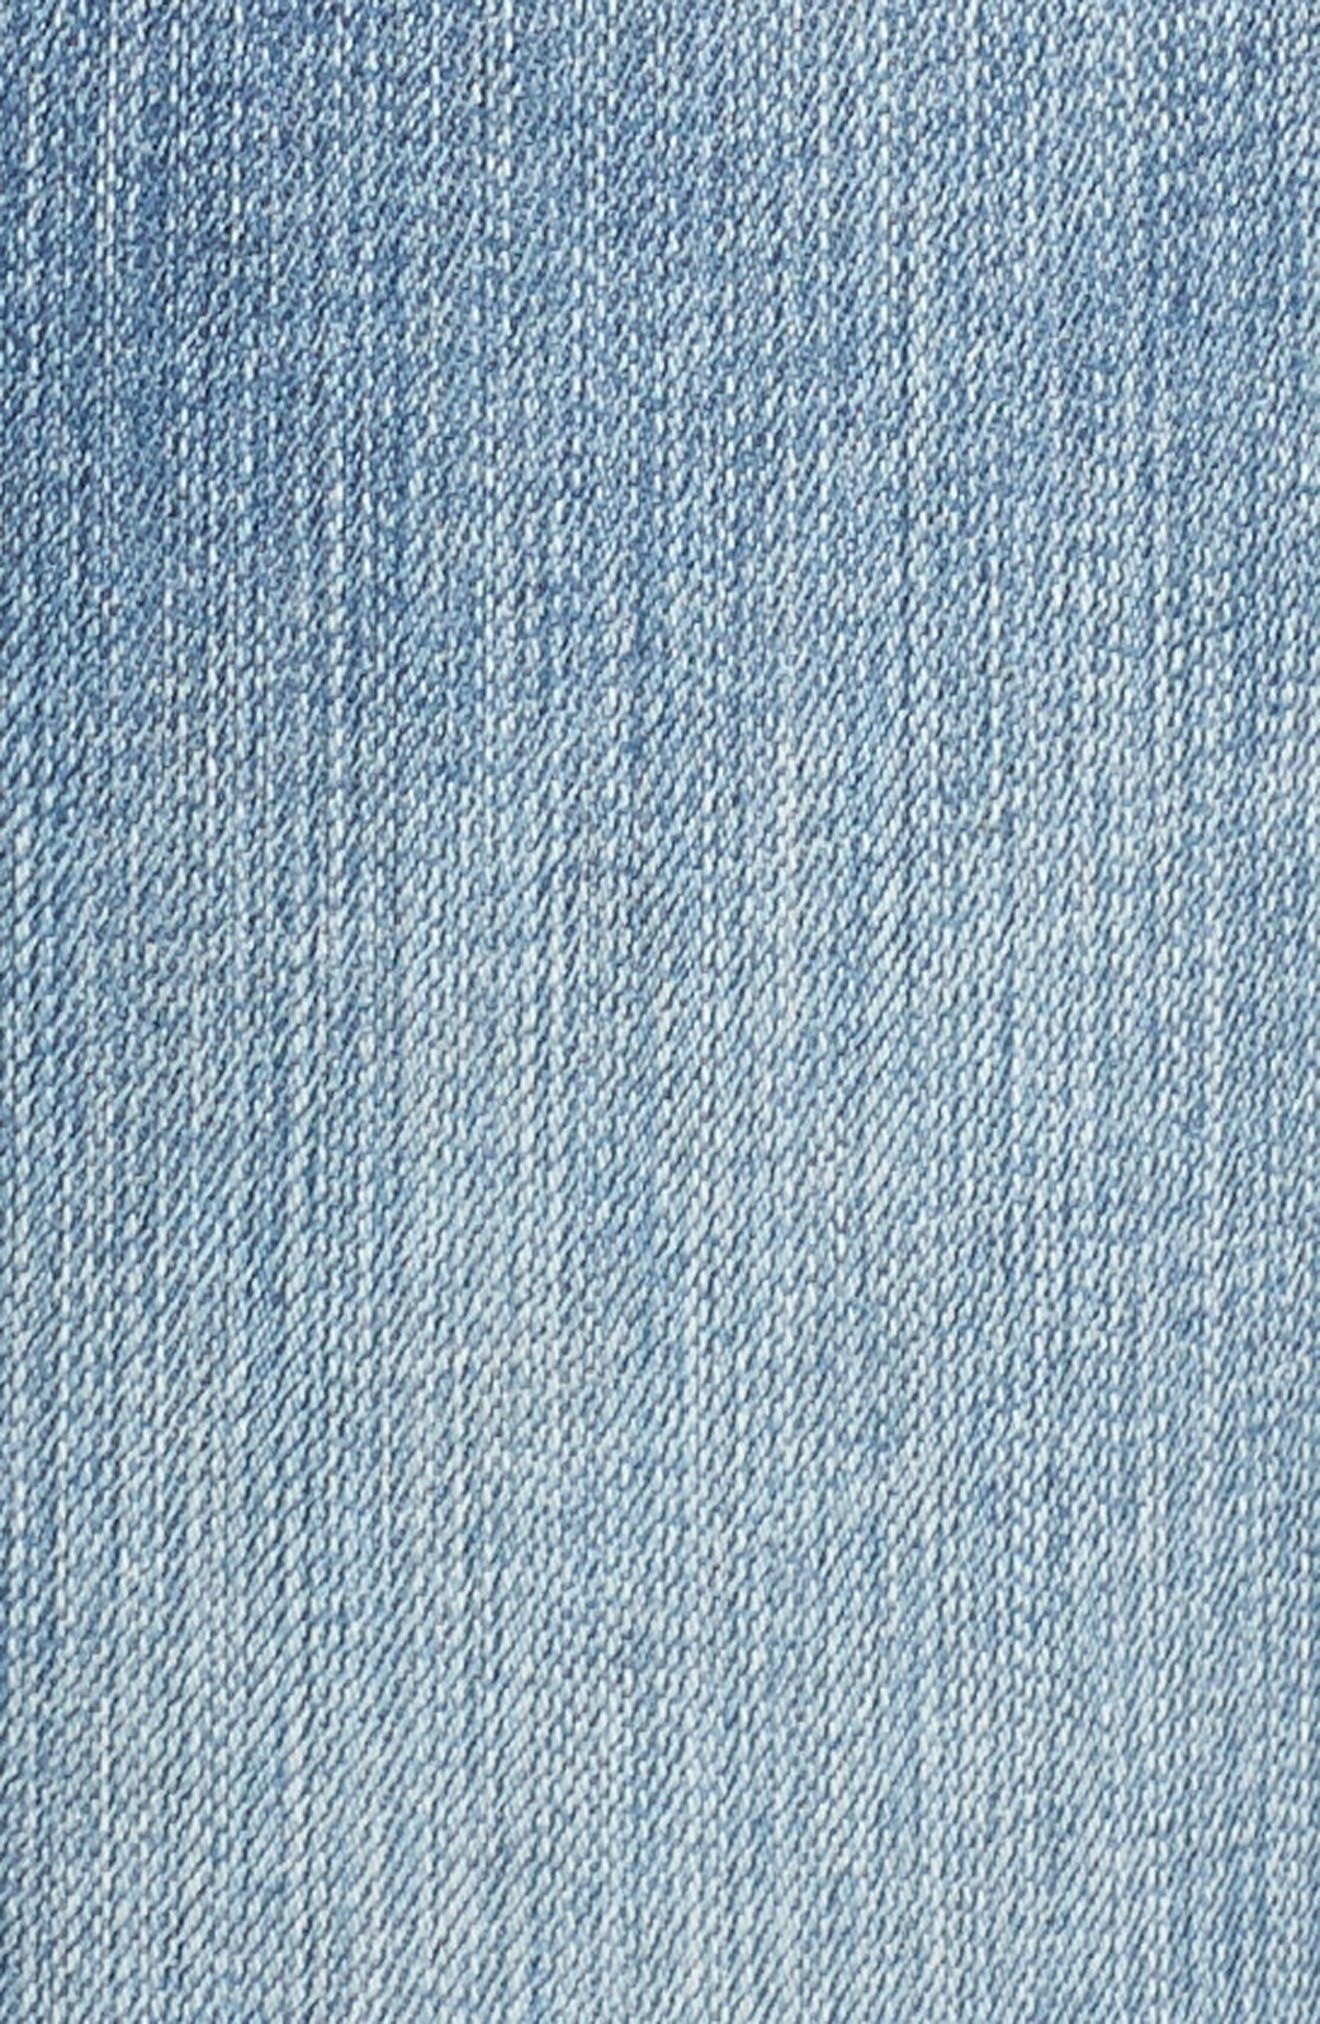 Alternate Image 3  - Jag Jeans Carter Girlfriend Jeans (Plus Size)